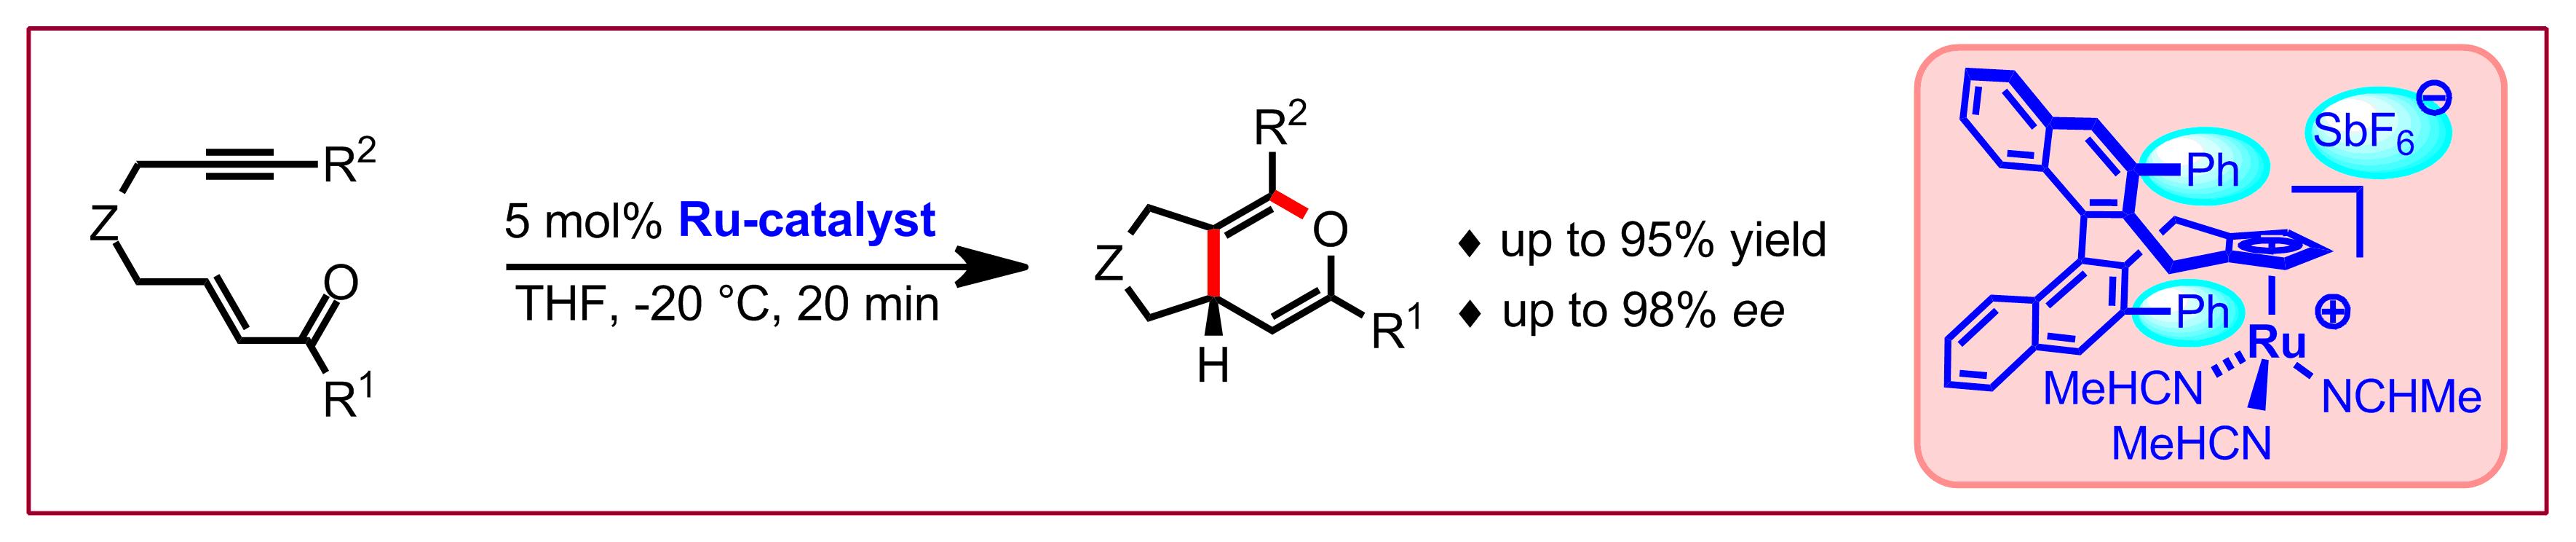 "be952df8c65 C. Heinz, N. Cramer, J. Am. Chem. Soc. 2015, 137, 11278-11281: ""Synthesis  of Fijiolide A via an Atropselective Paracyclophane Formation"""